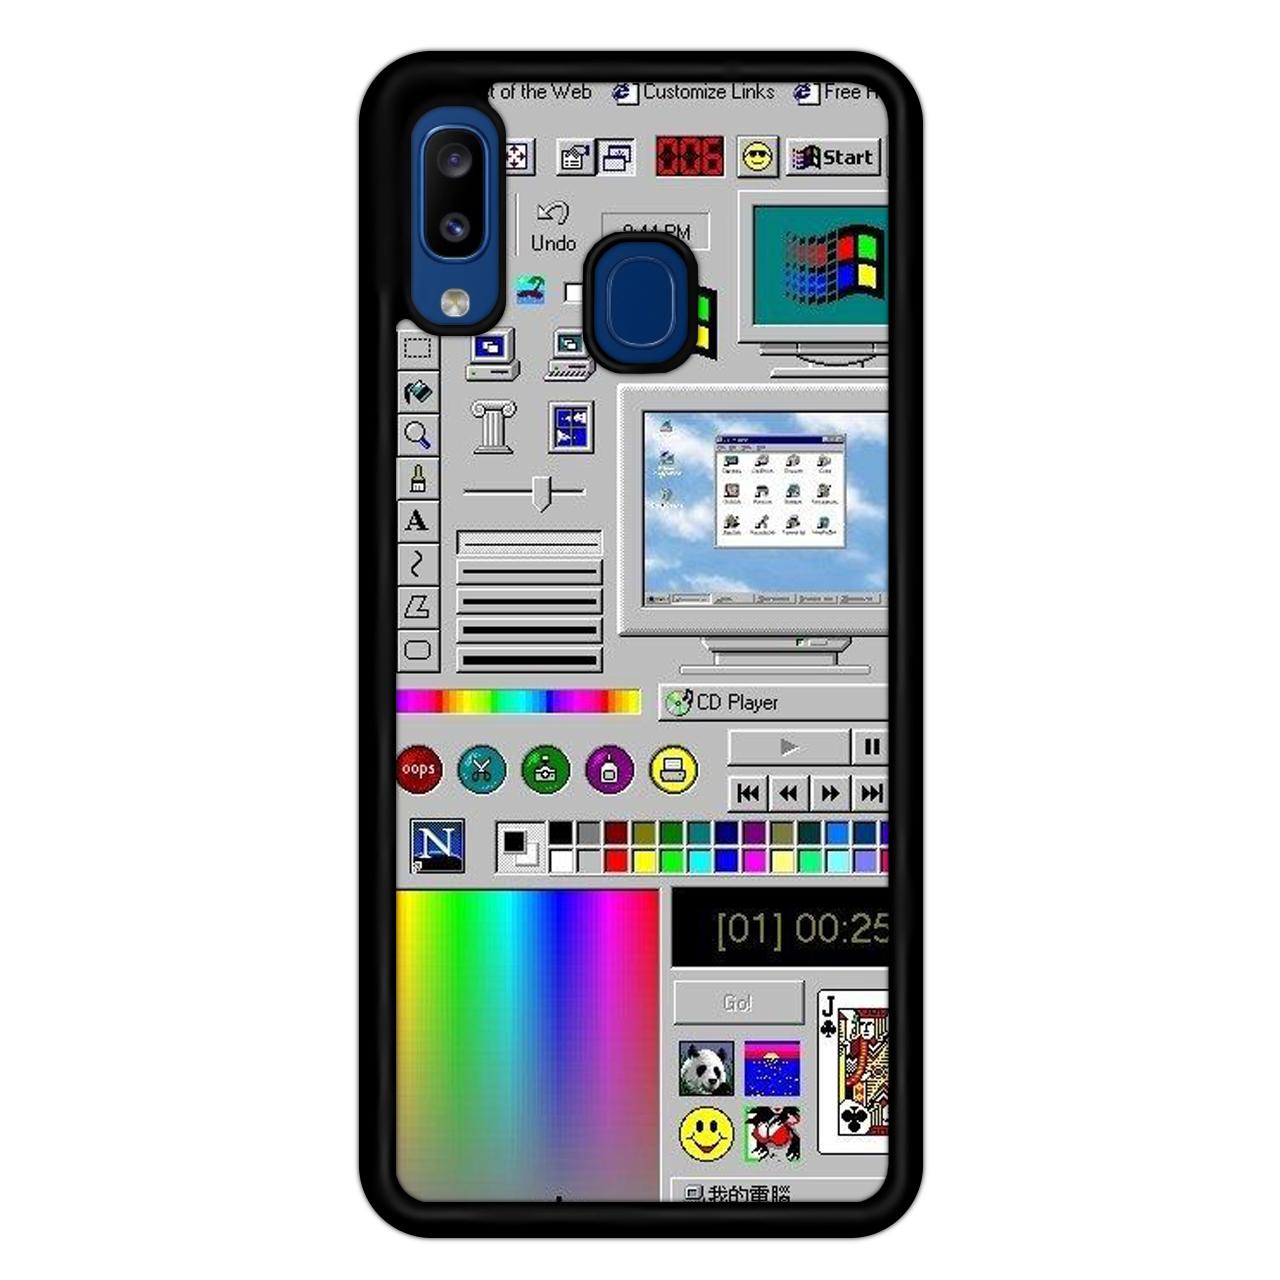 کاور آکام مدل Aa201704 مناسب برای گوشی موبایل سامسونگ Galaxy A20/A30